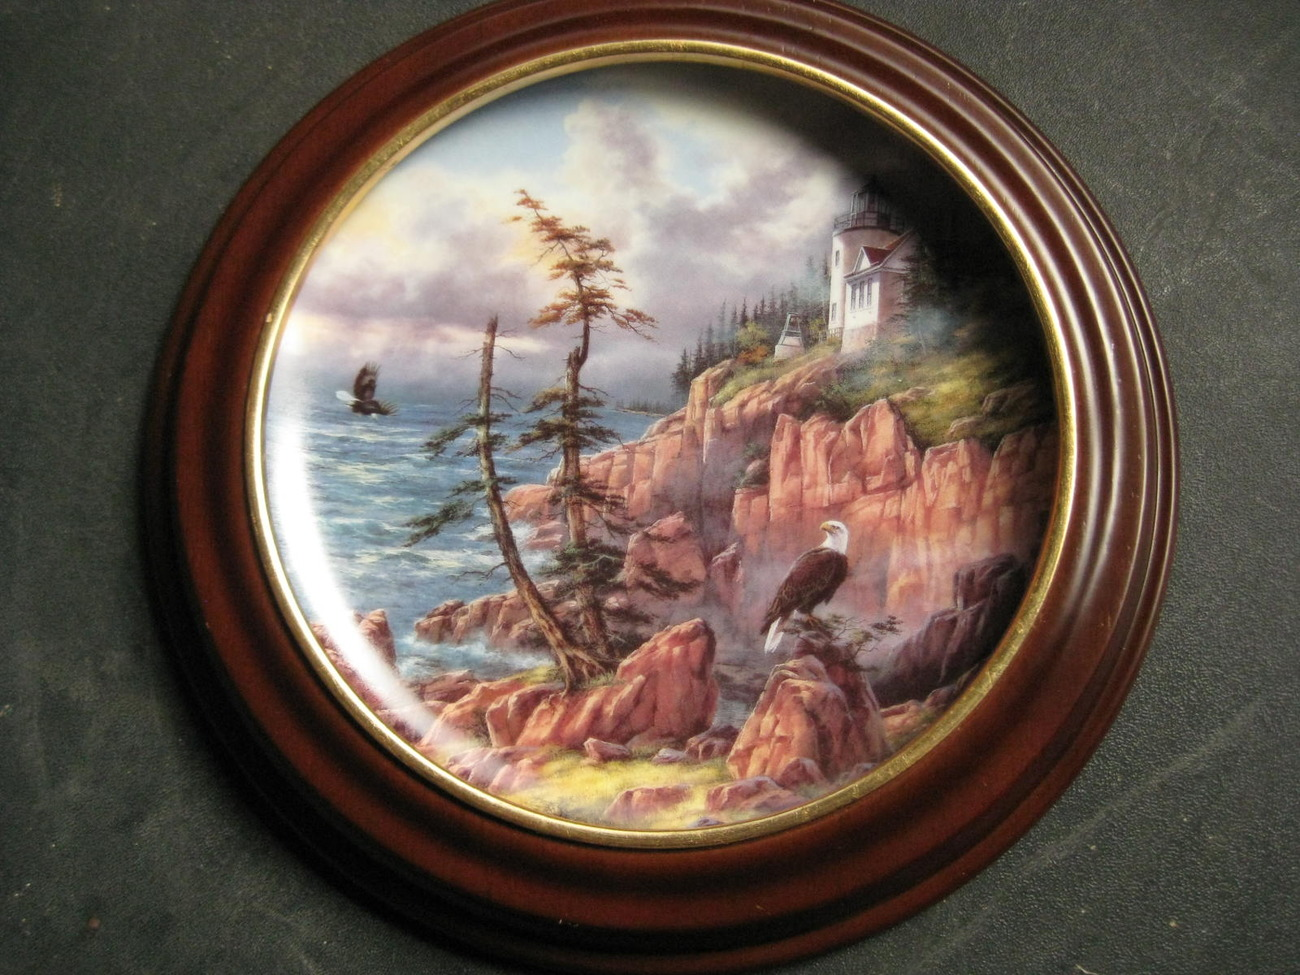 Framed Plate-Vigilant Beacon from God Bless America Series-Danbury Mint image 2